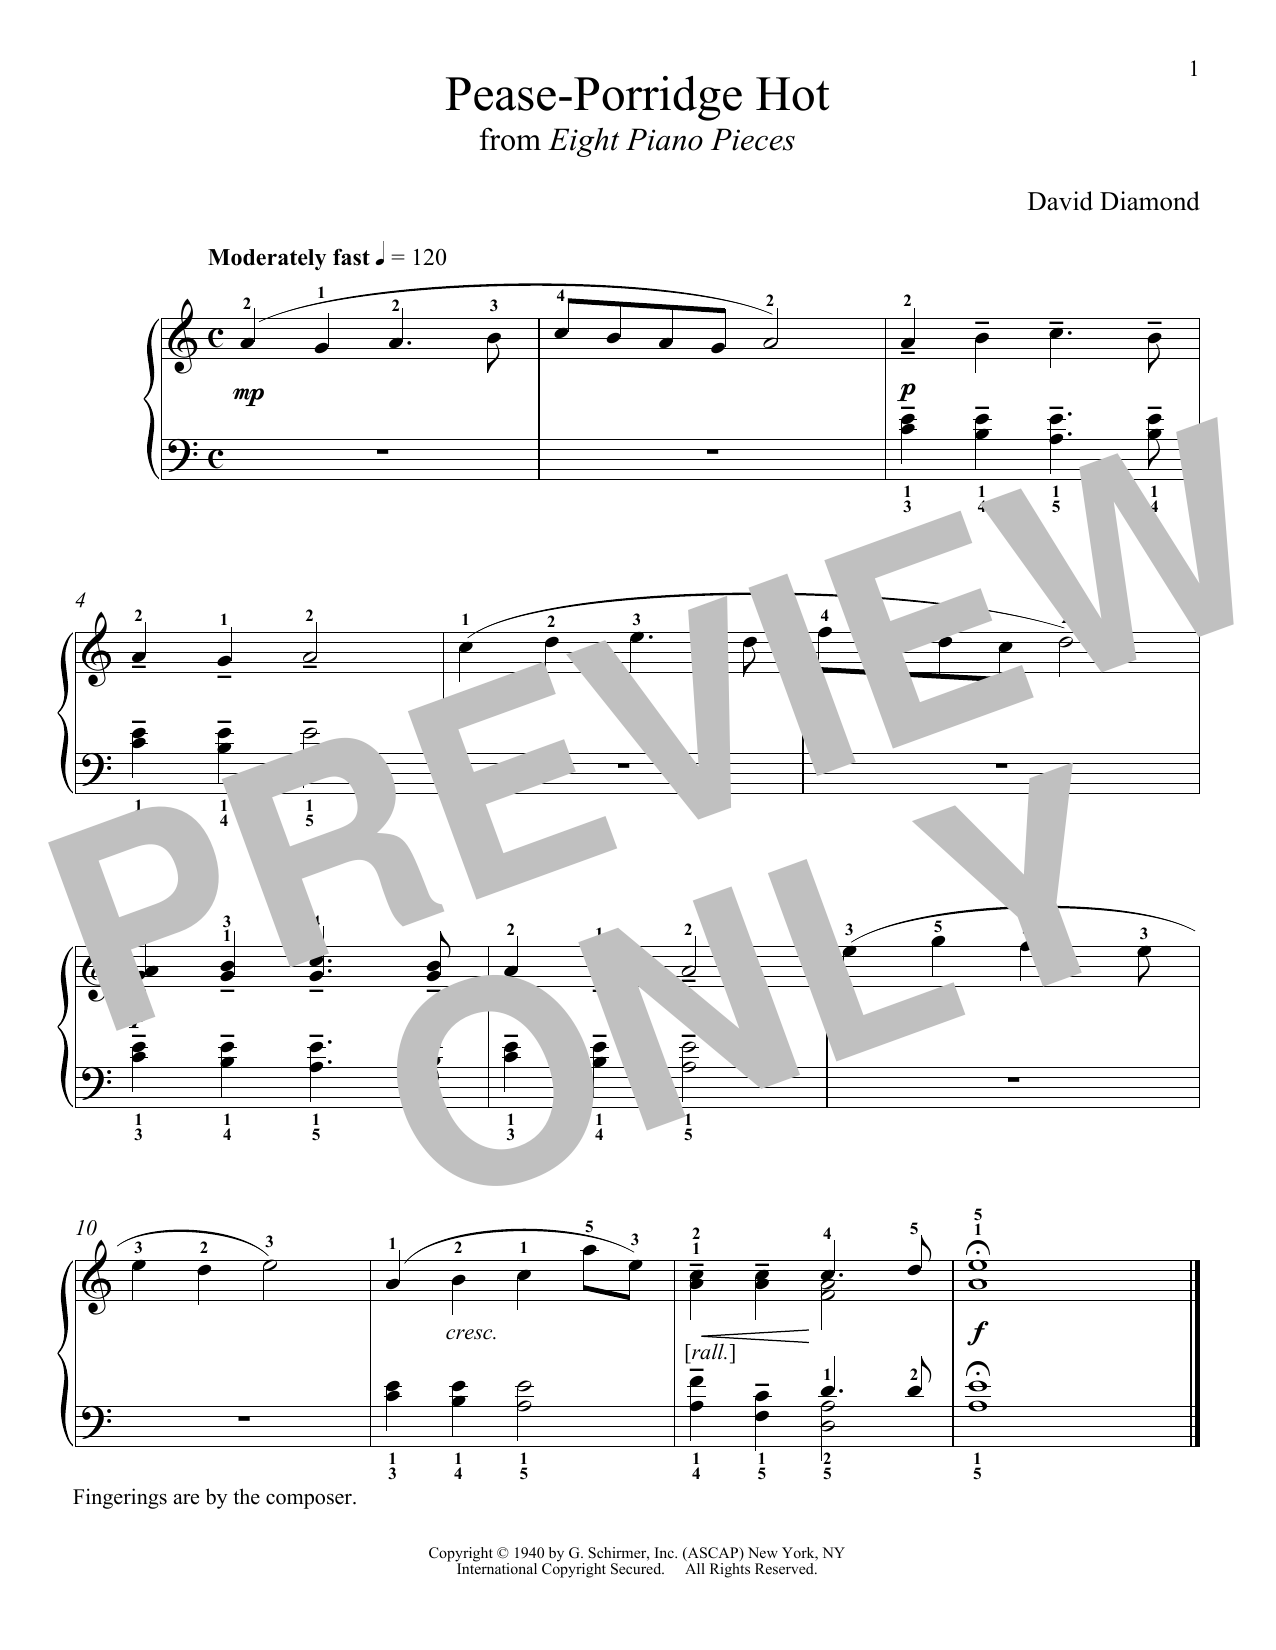 David Diamond Pease-Porridge Hot sheet music notes and chords